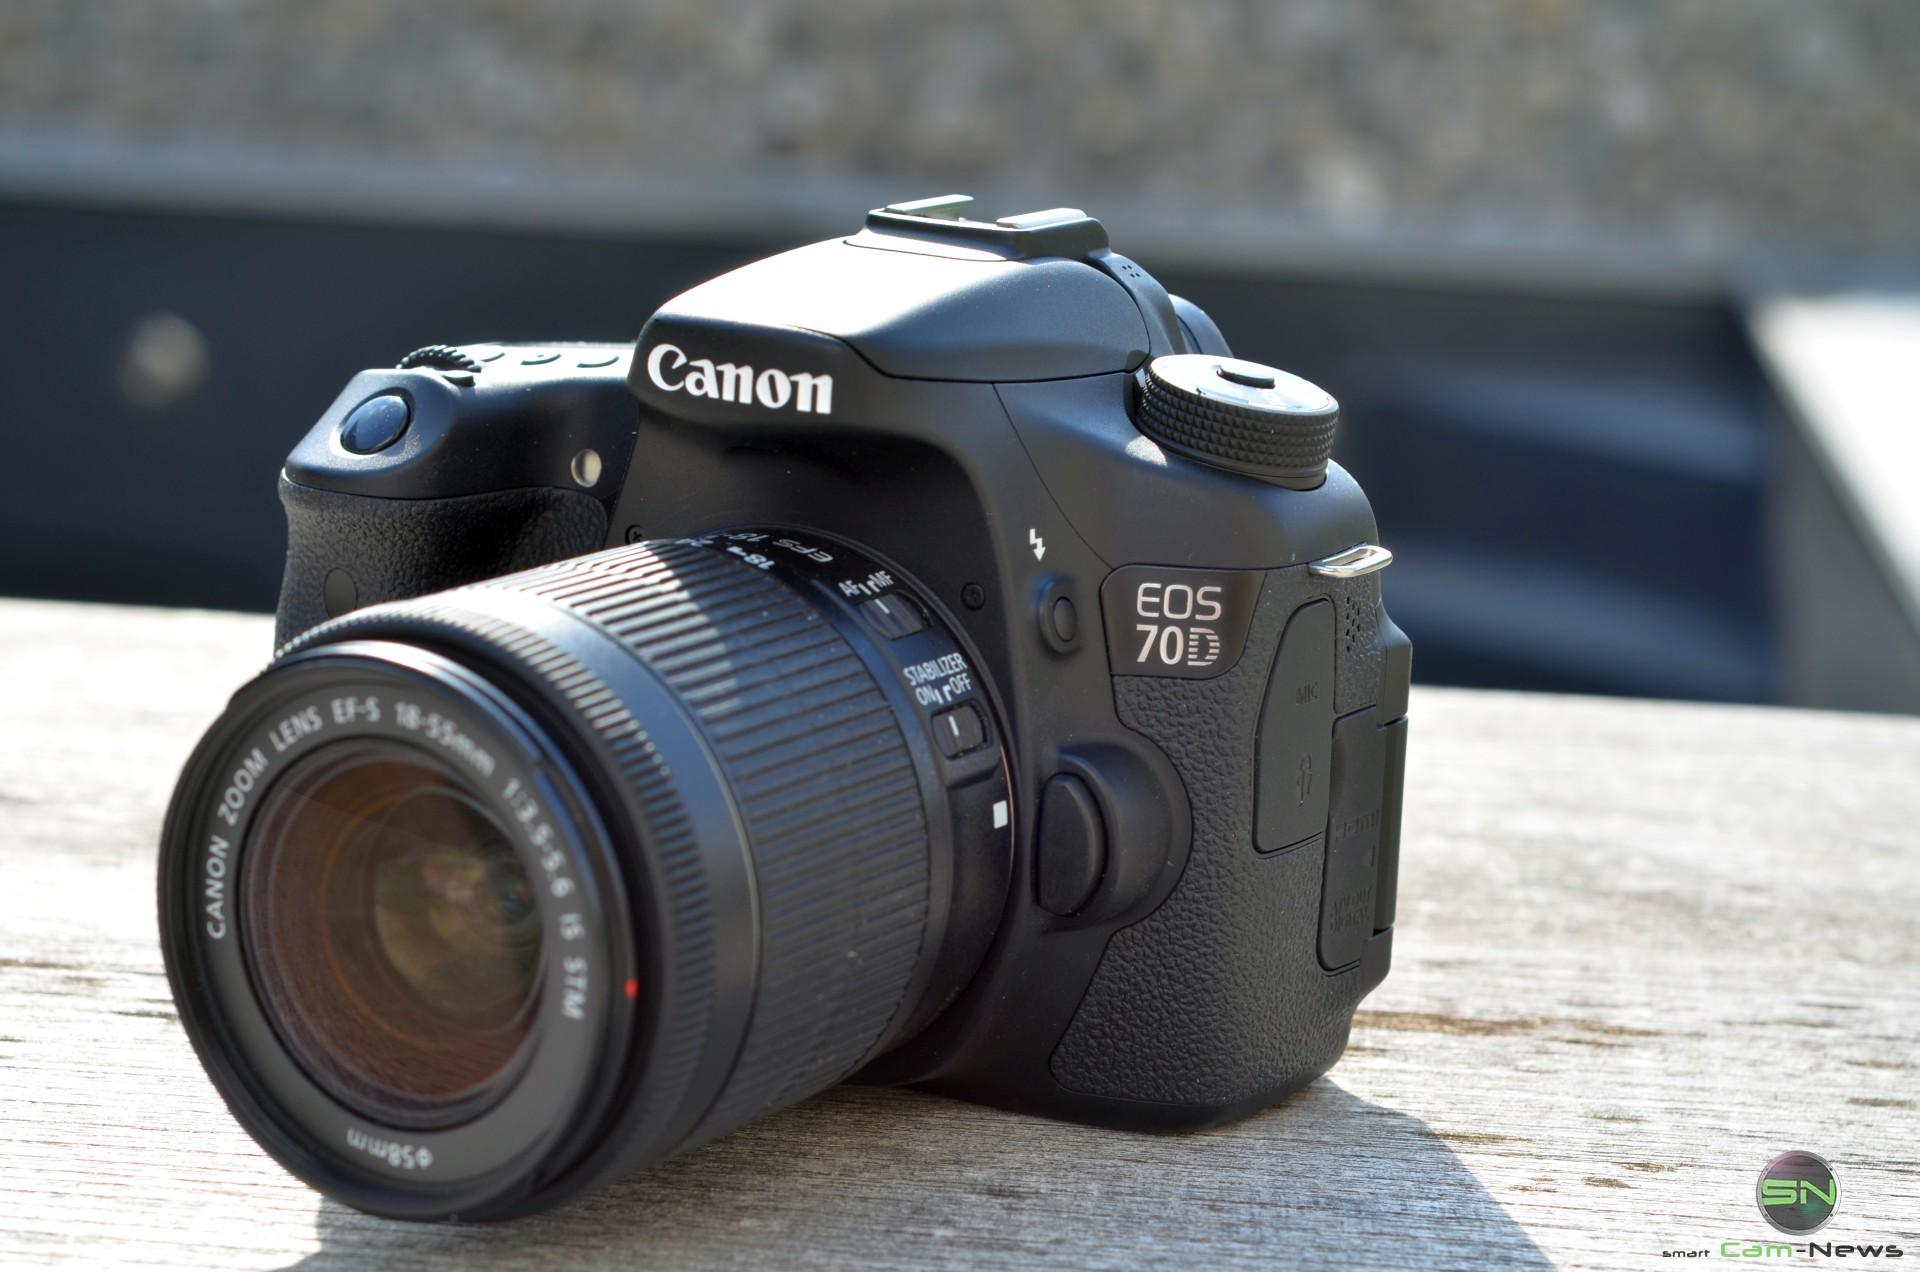 Canon EOS 70D – Semiprofikamera